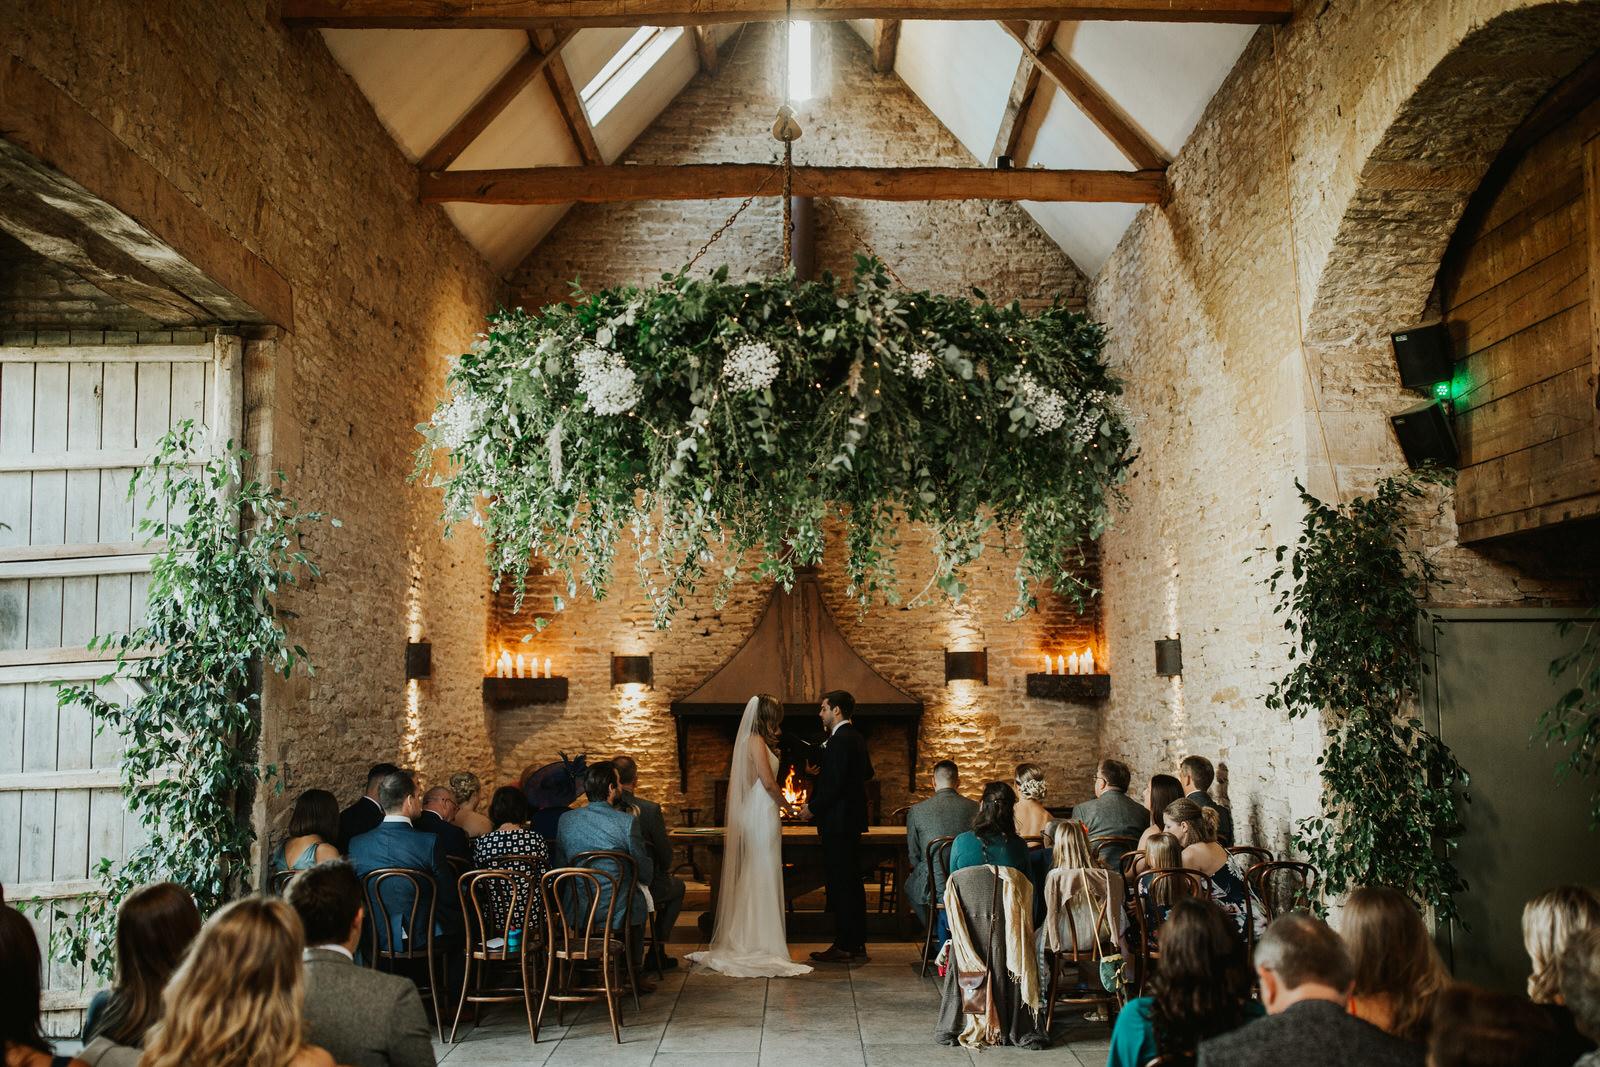 Stone Barn- Colin Ross Photography - Amy & Craig - 26.10.186C4A6830stone+barn+cotswold+wedding+venue.jpg